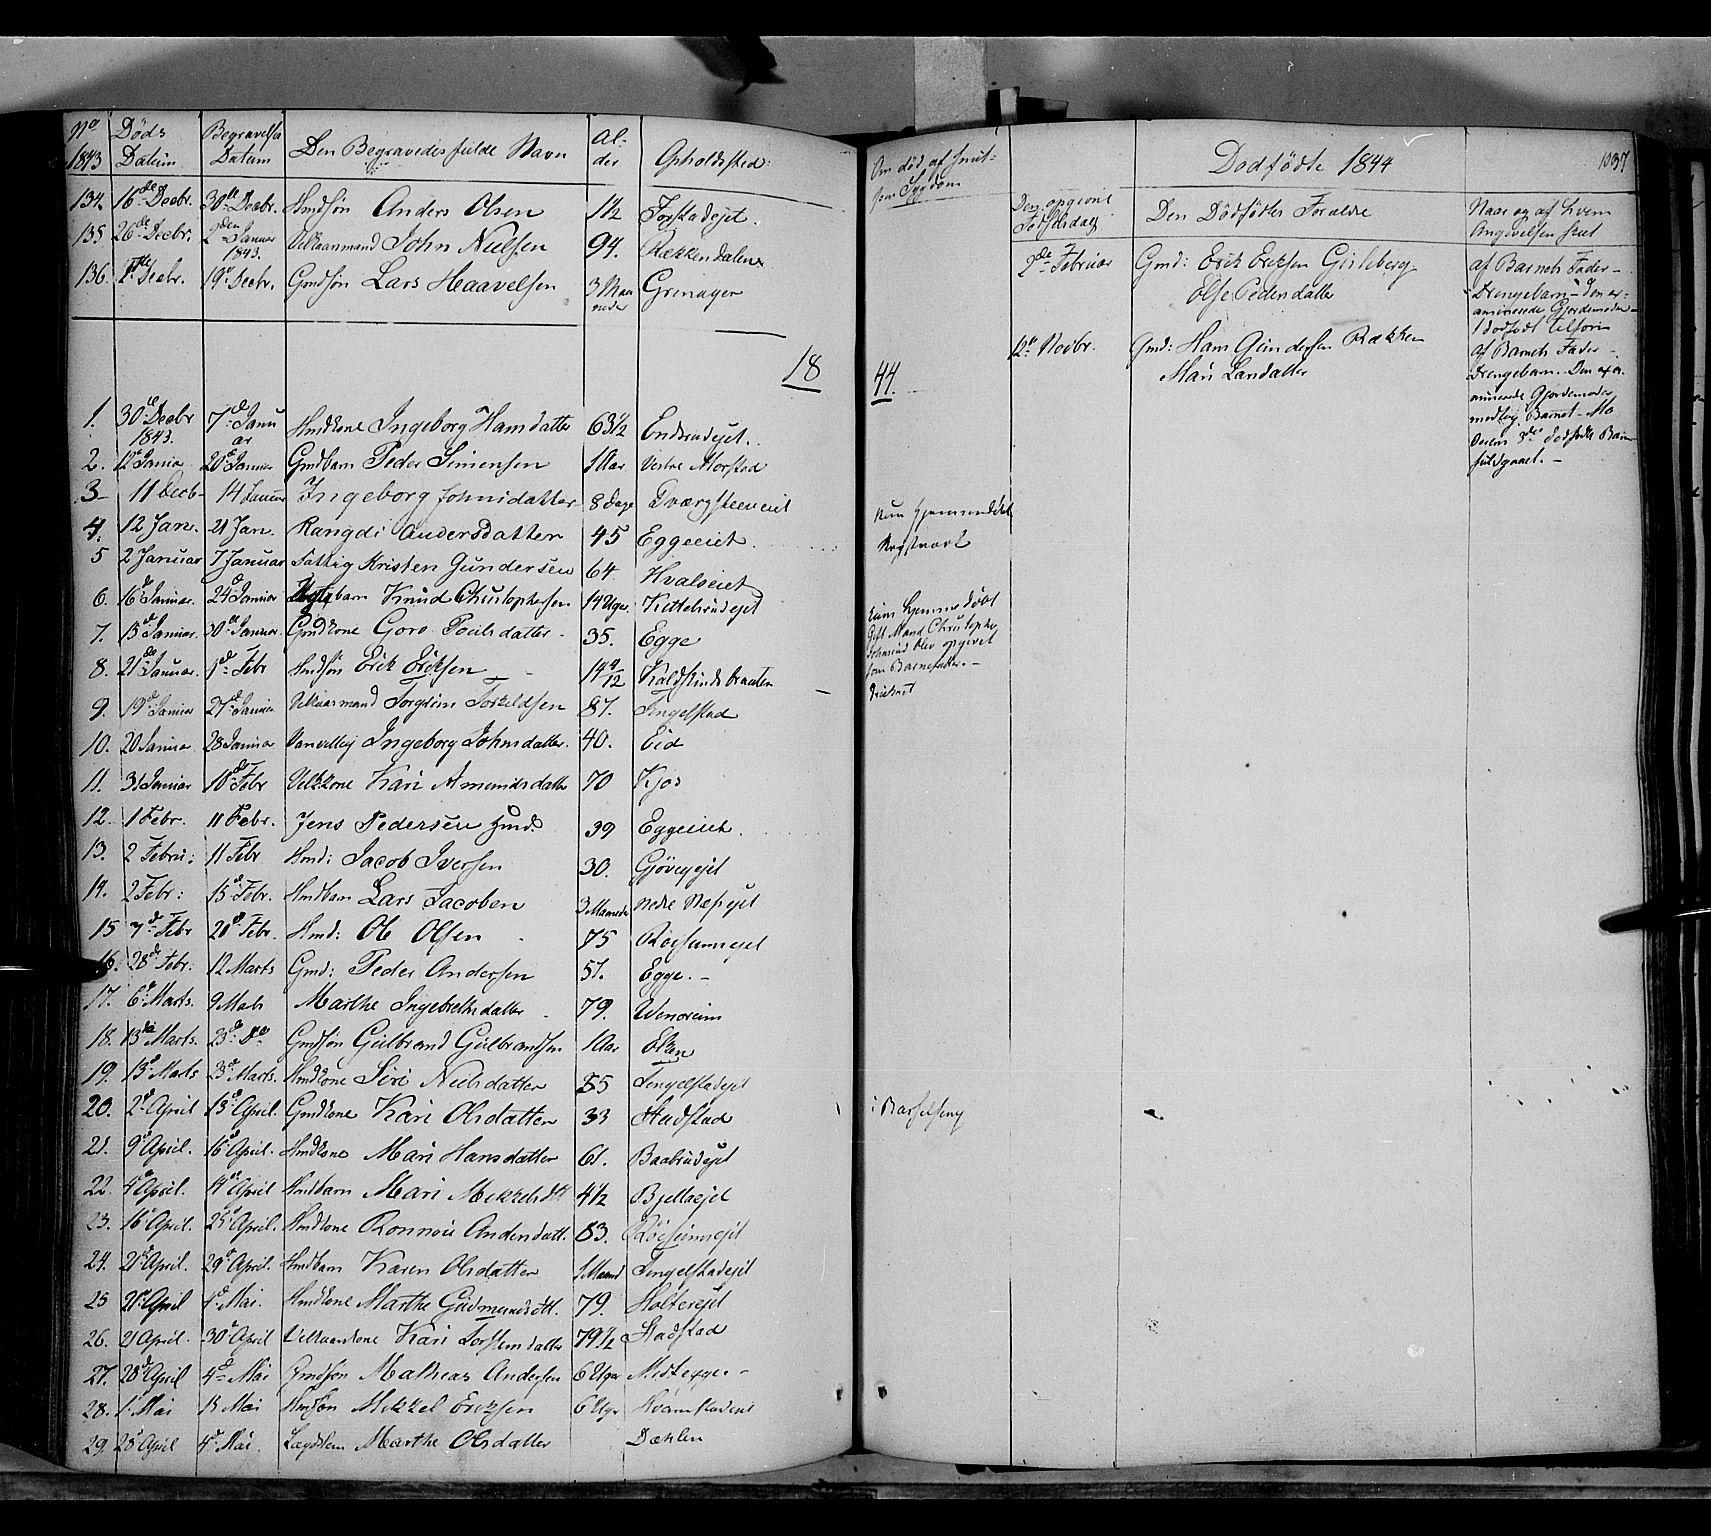 SAH, Gran prestekontor, Ministerialbok nr. 11, 1842-1856, s. 1036-1037